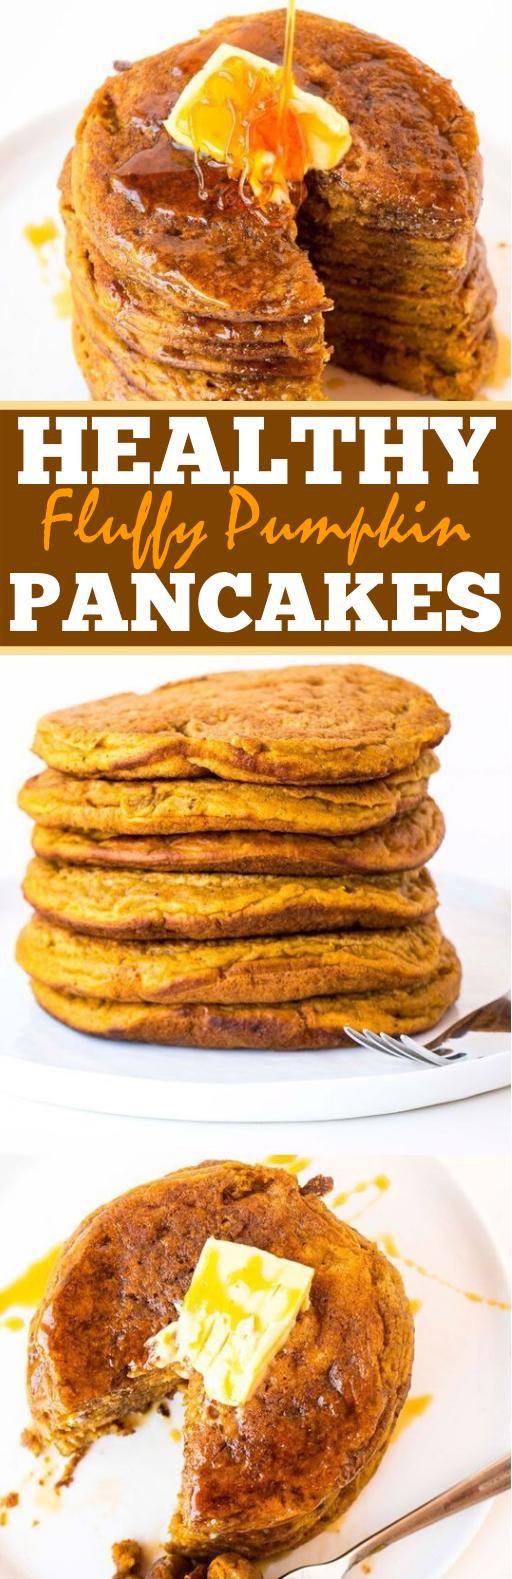 Healthy Fluffy Pumpkin Pancakes #healthy #breakfast #glutenfree #vegetarian #whole30